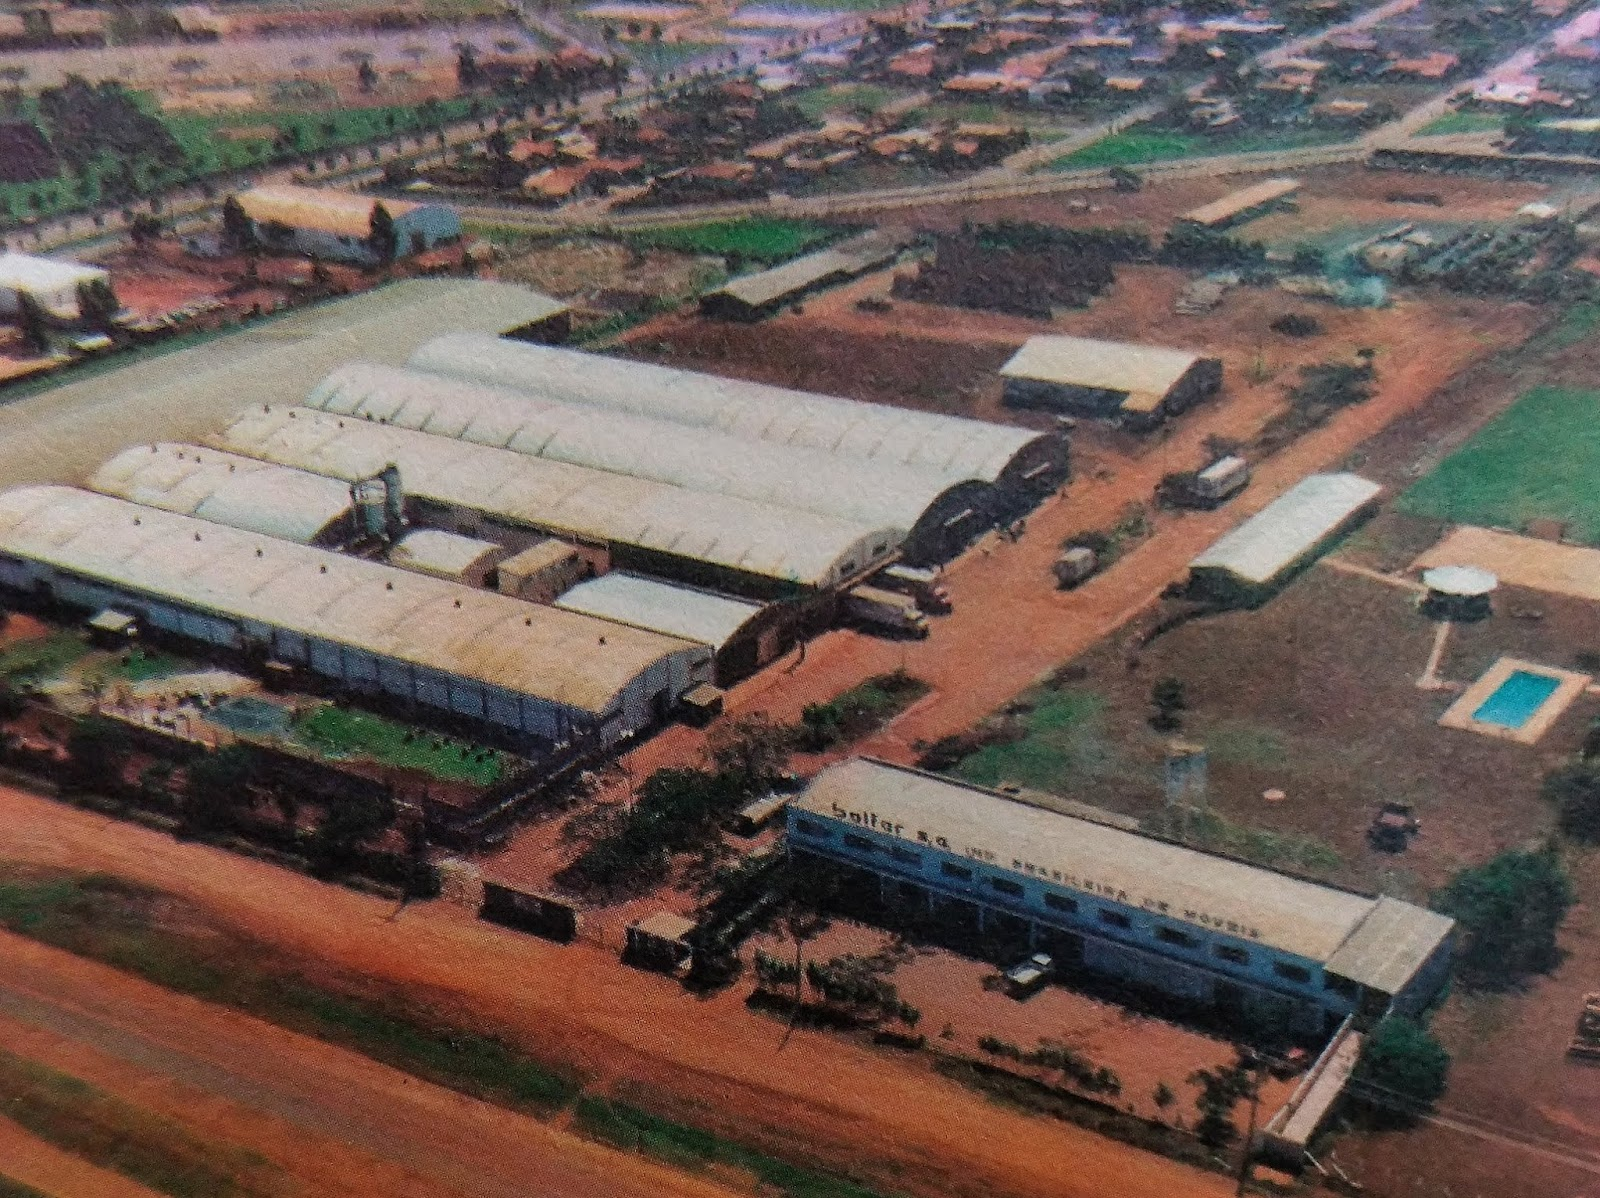 Balfar S/A - Indústria Brasileira de Móveis